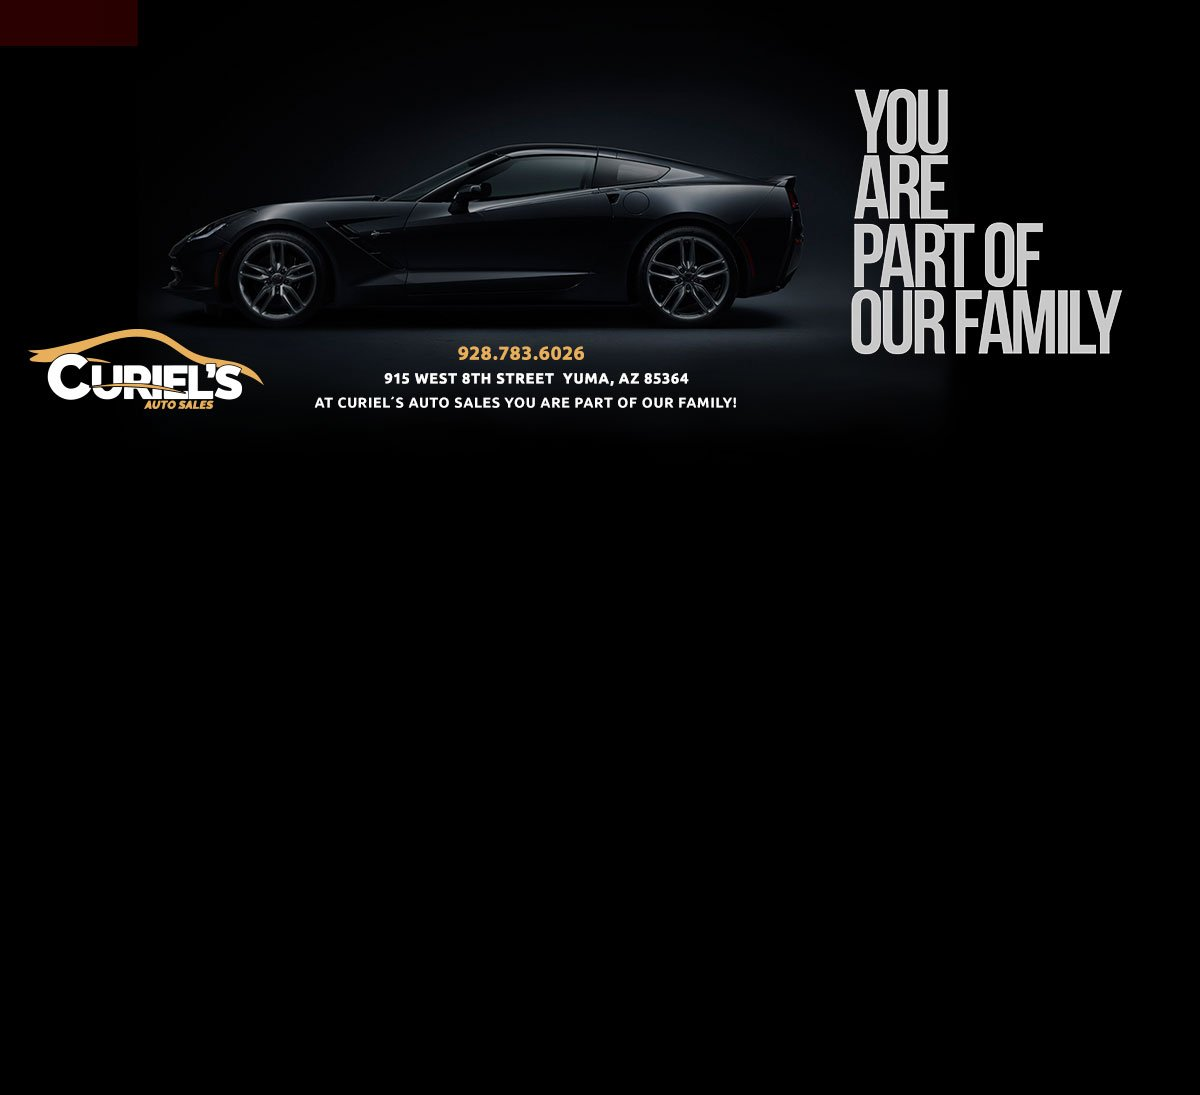 Honda Used Cars Pickup Trucks For Sale Yuma CURIELS AUTO SALES LLC